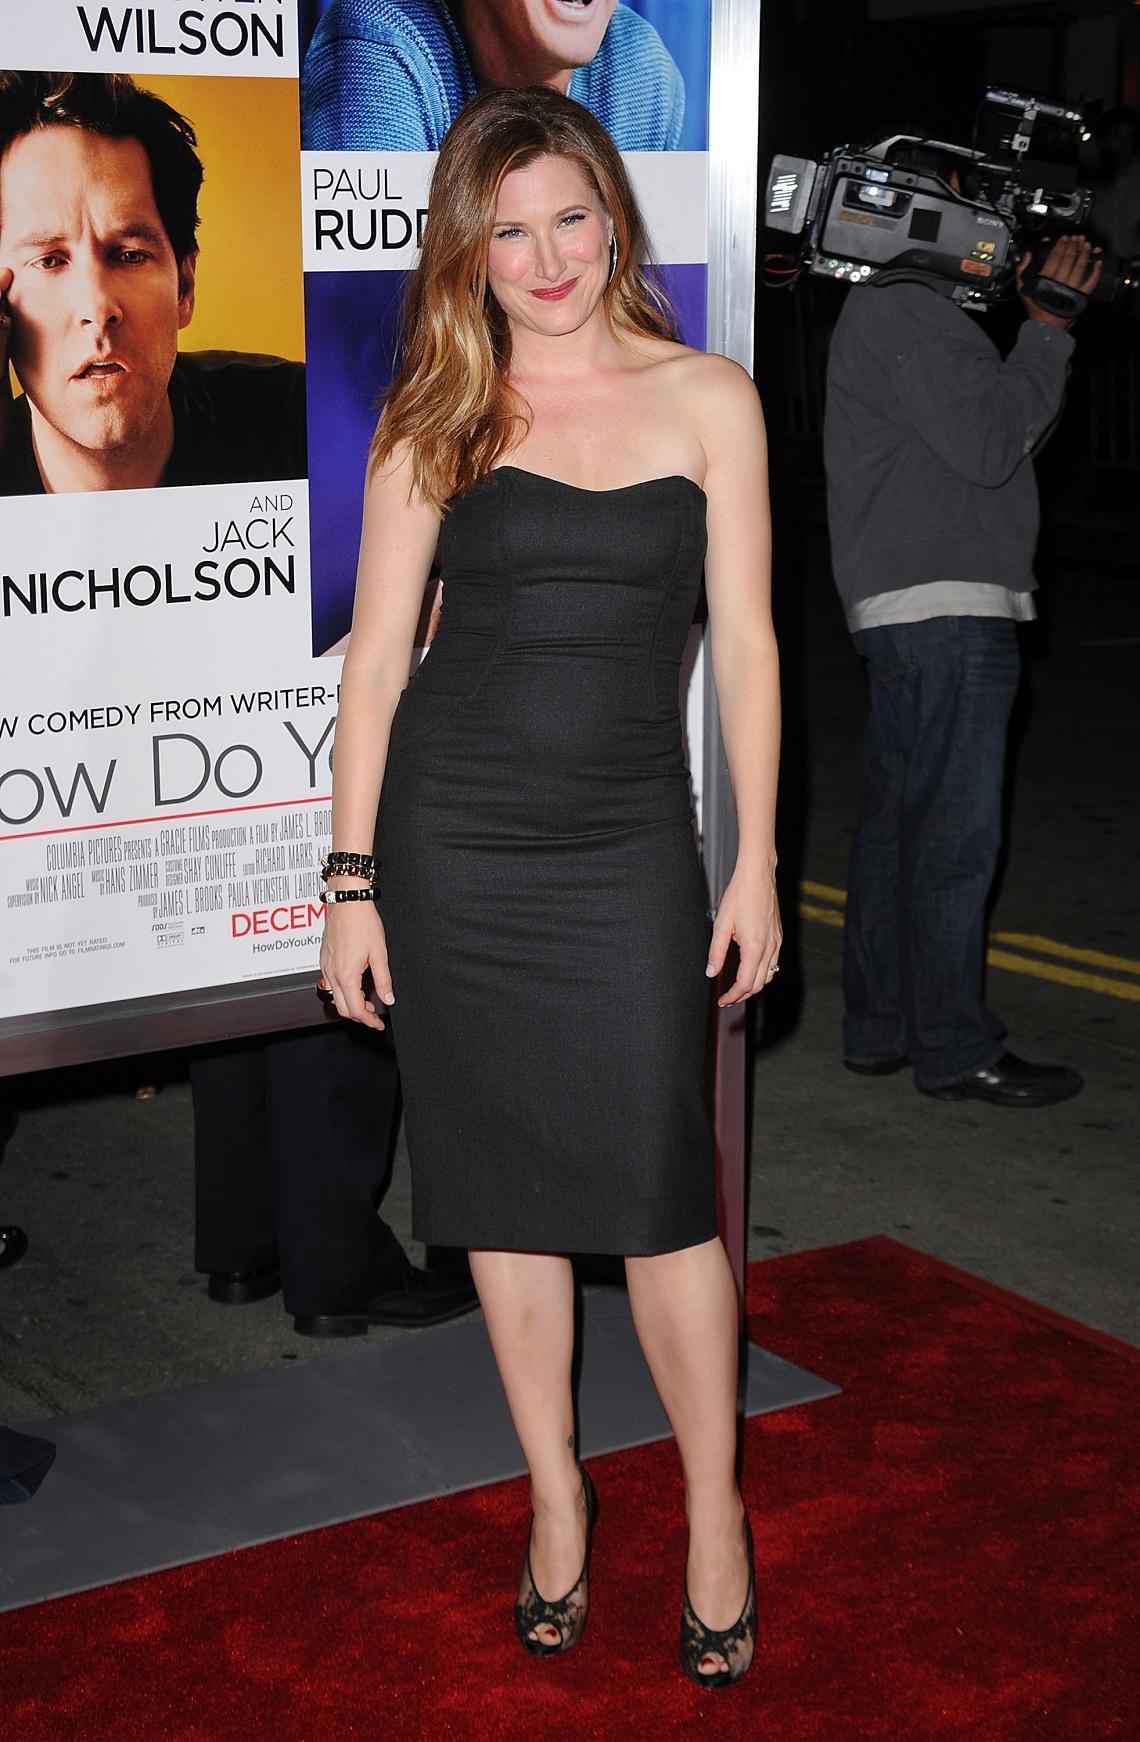 El Diablos Celebrity News: Kathryn Hahn nude in Hung